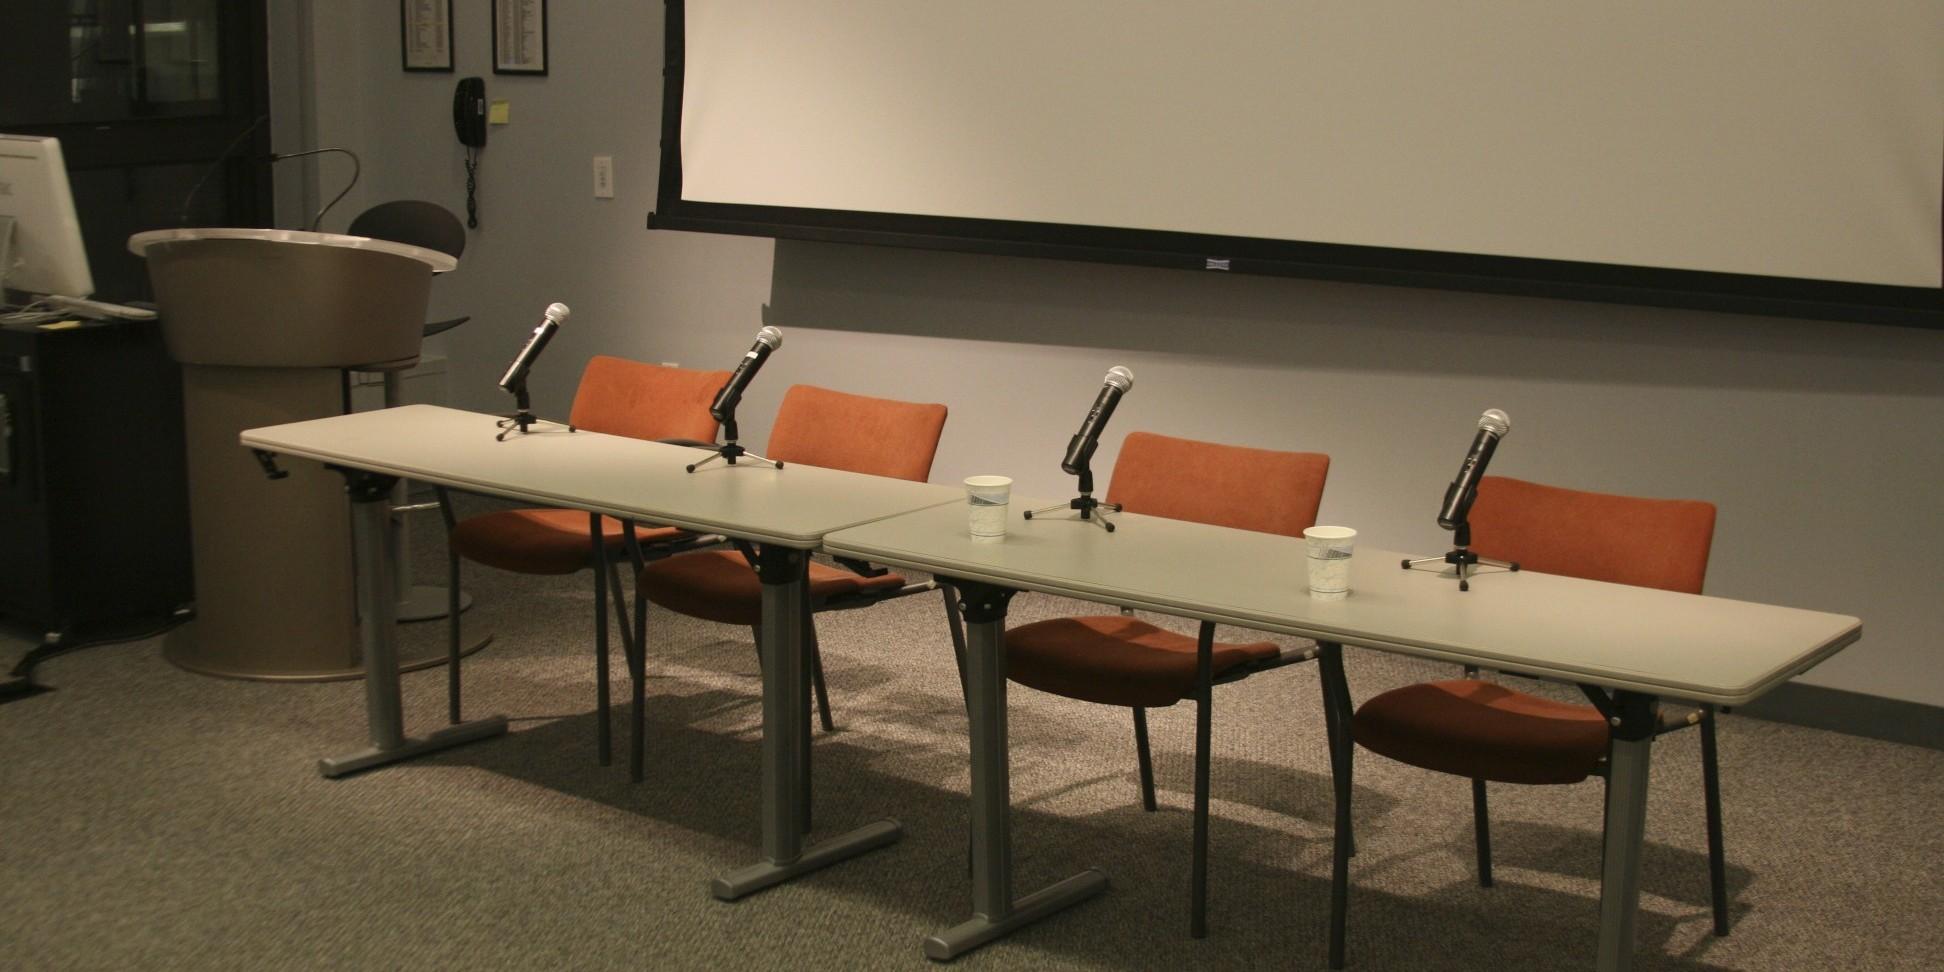 panel seats